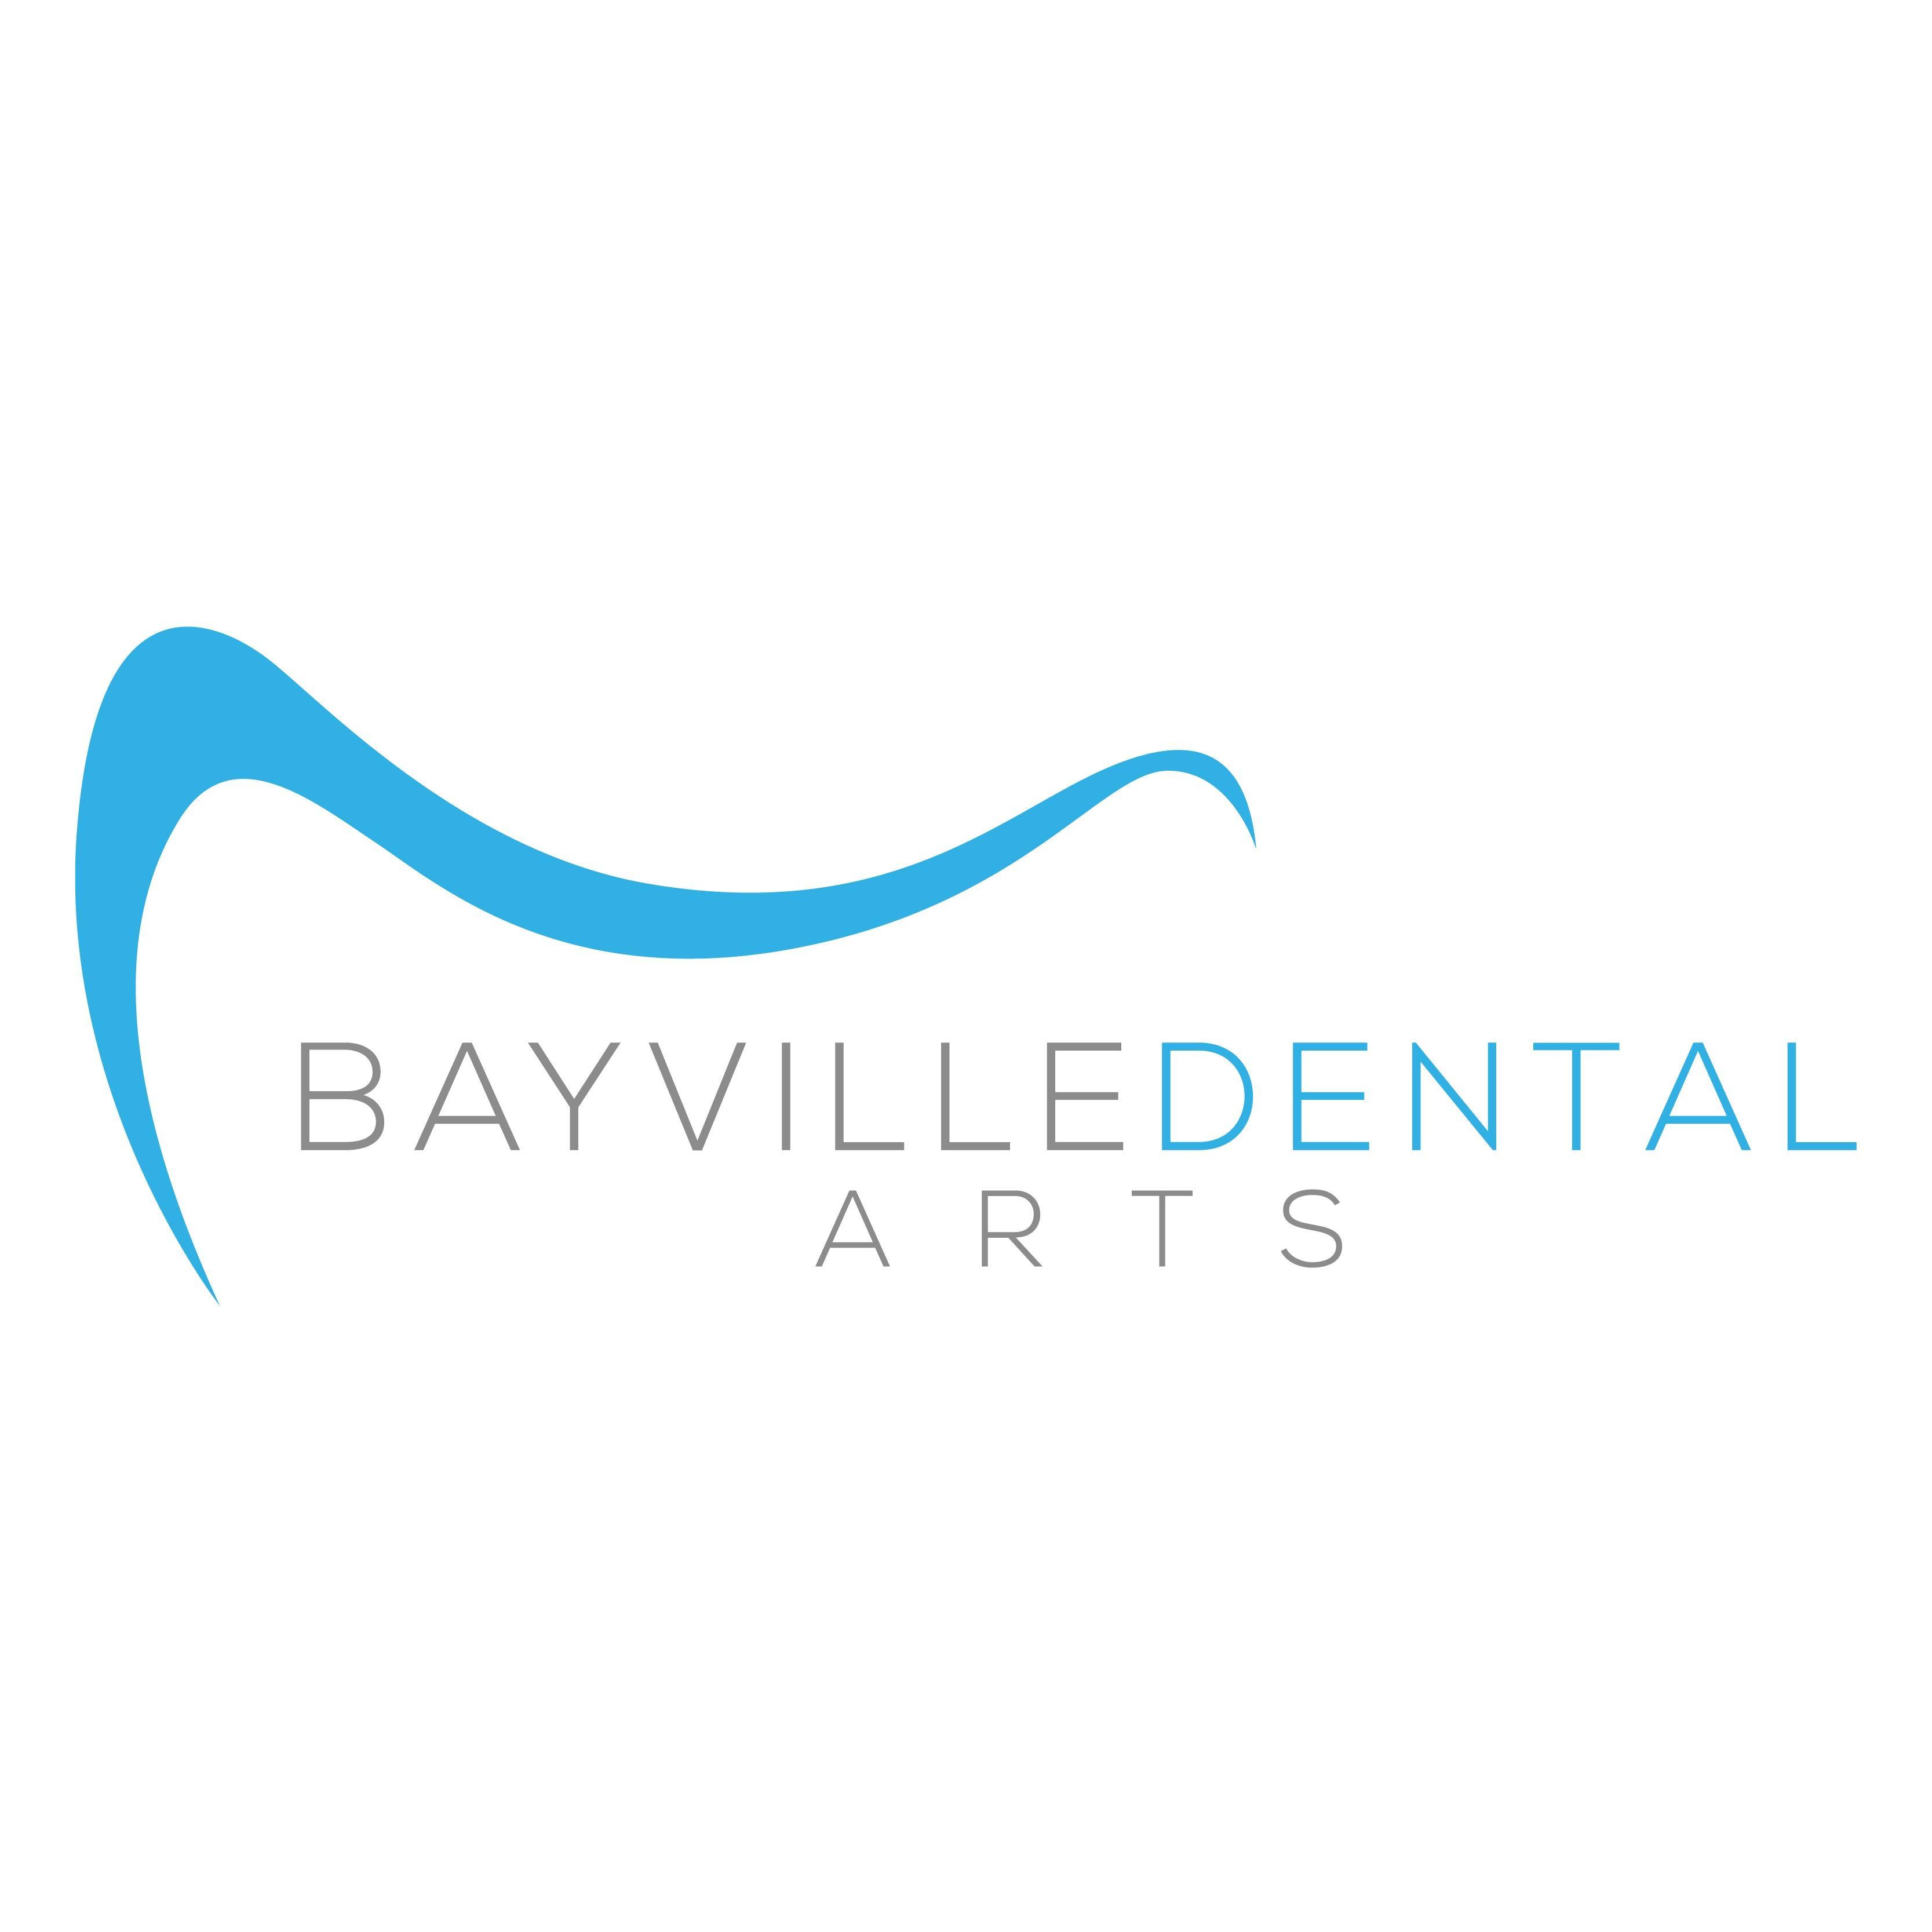 Bayville Dental Arts